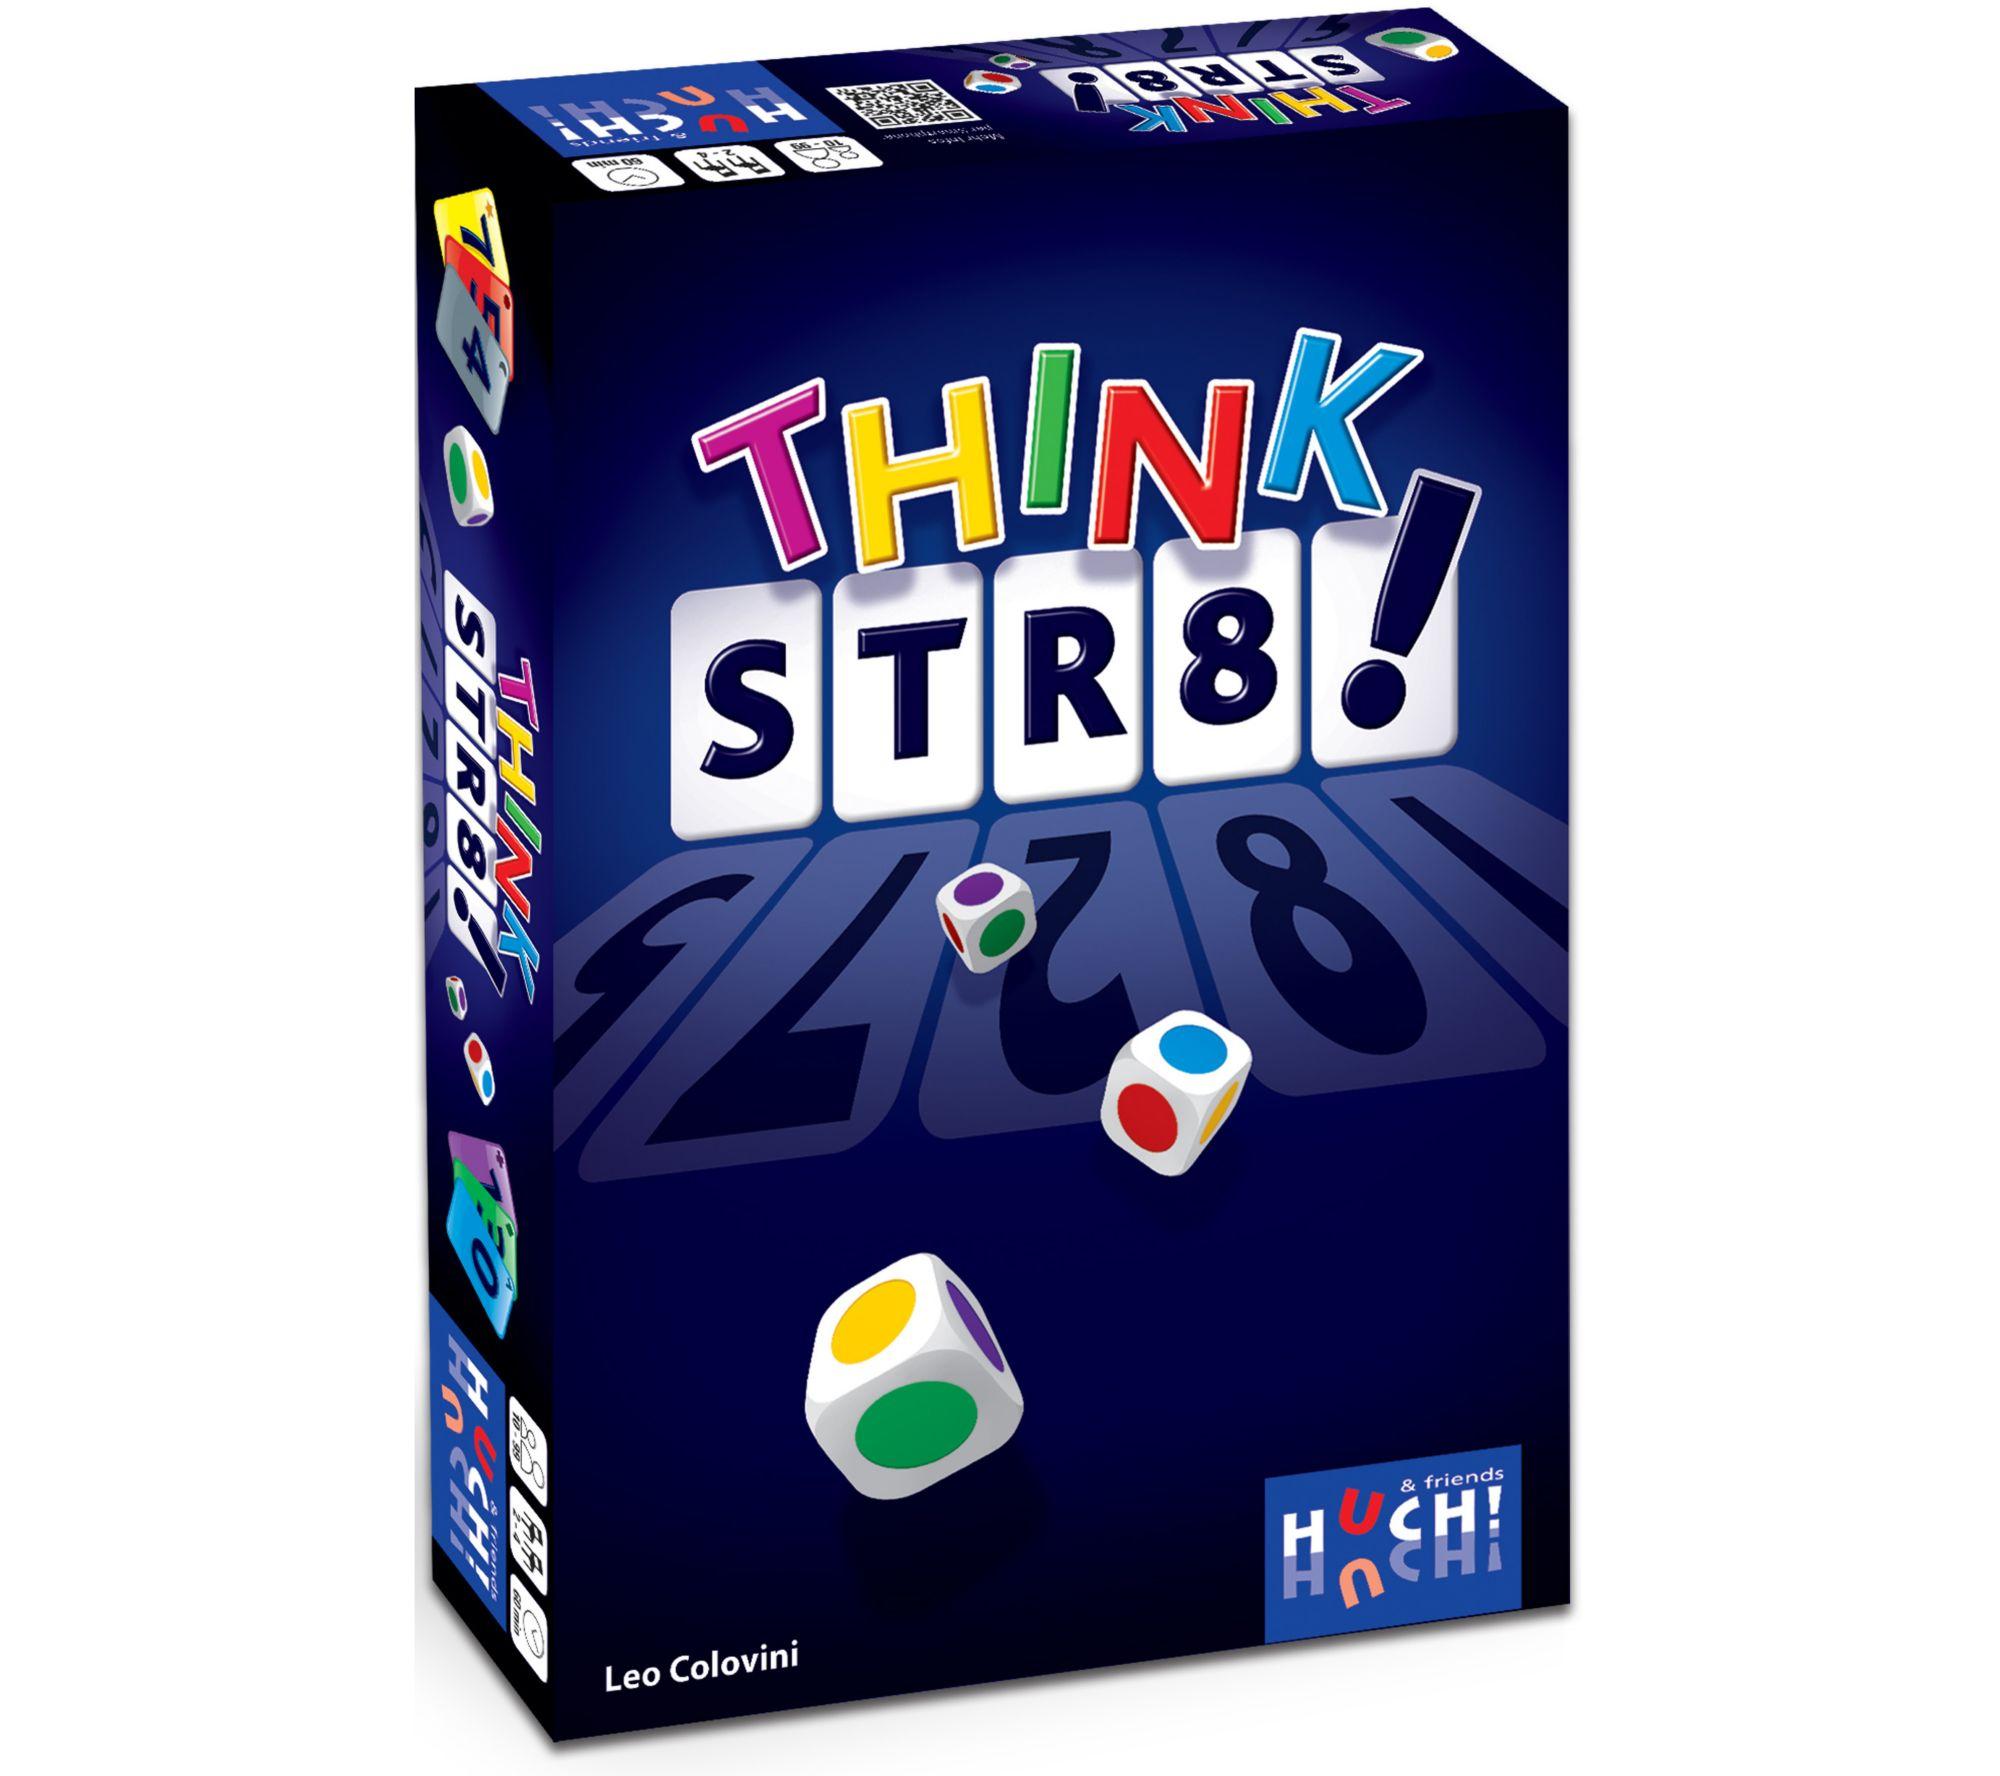 HUCH FRIENDS Huch! & friends Familienspiel, »Think Str8«